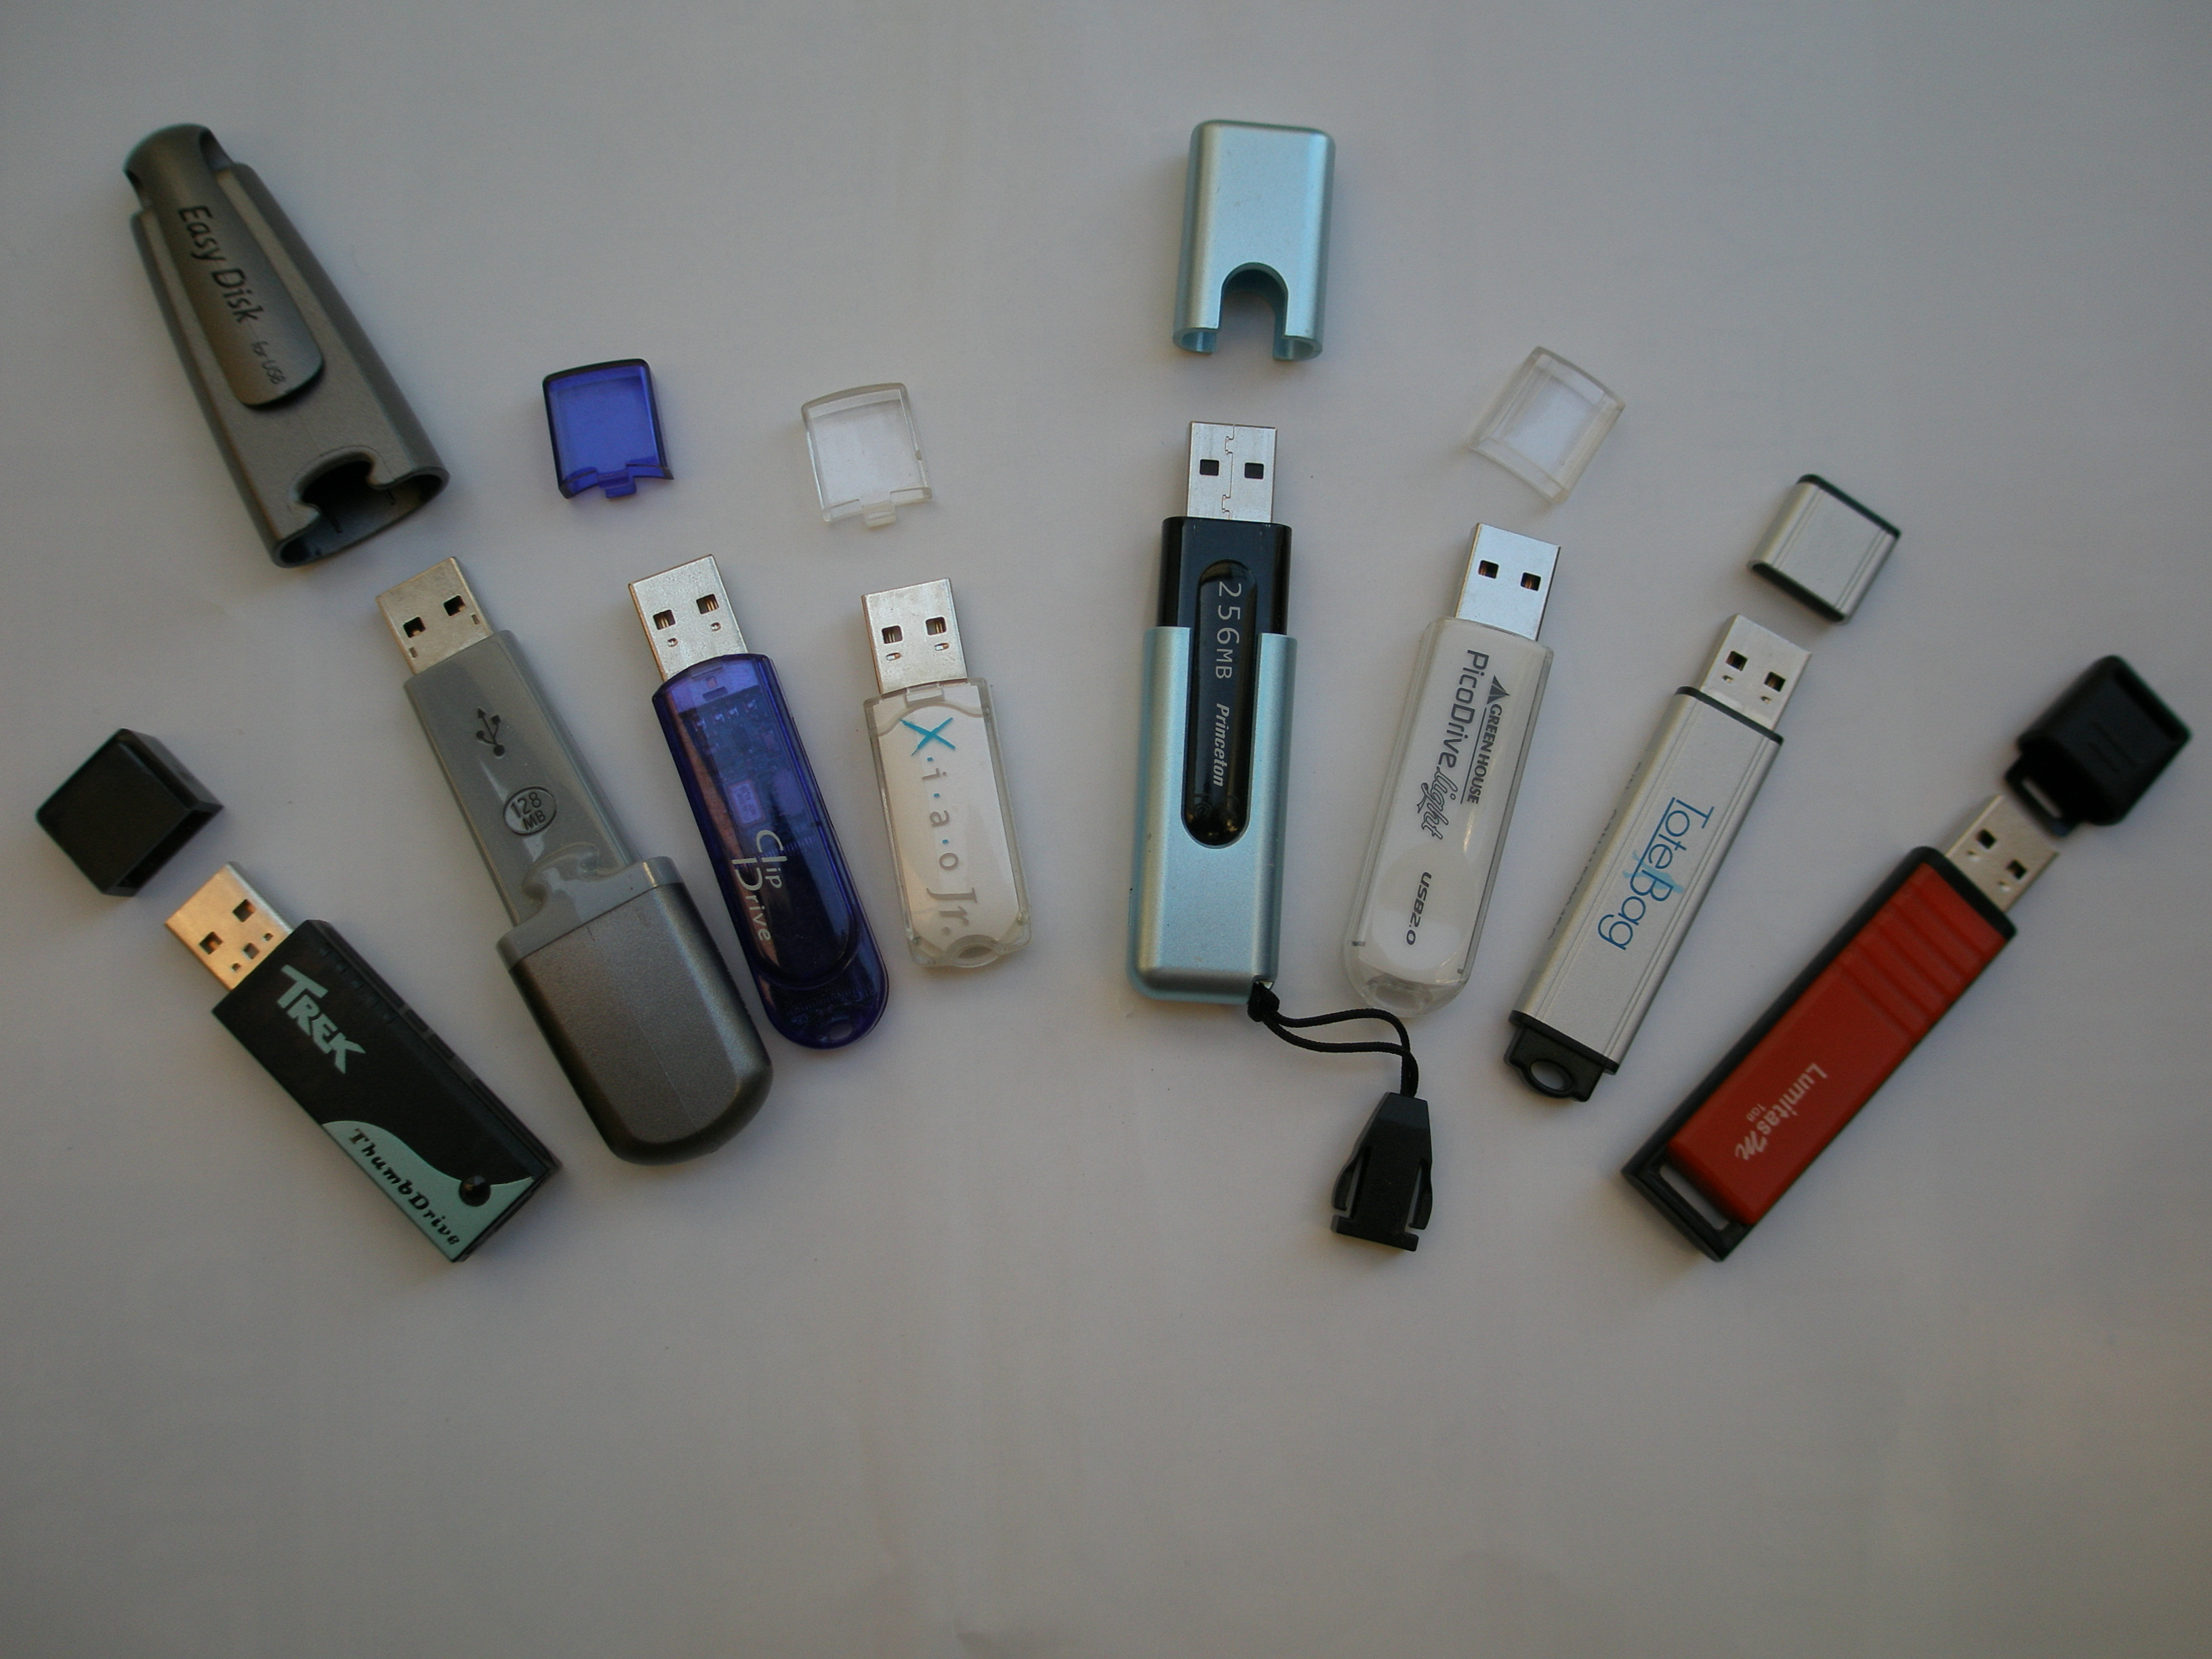 GENERIC USB MASS STORAGE DEVICE 64BIT DRIVER